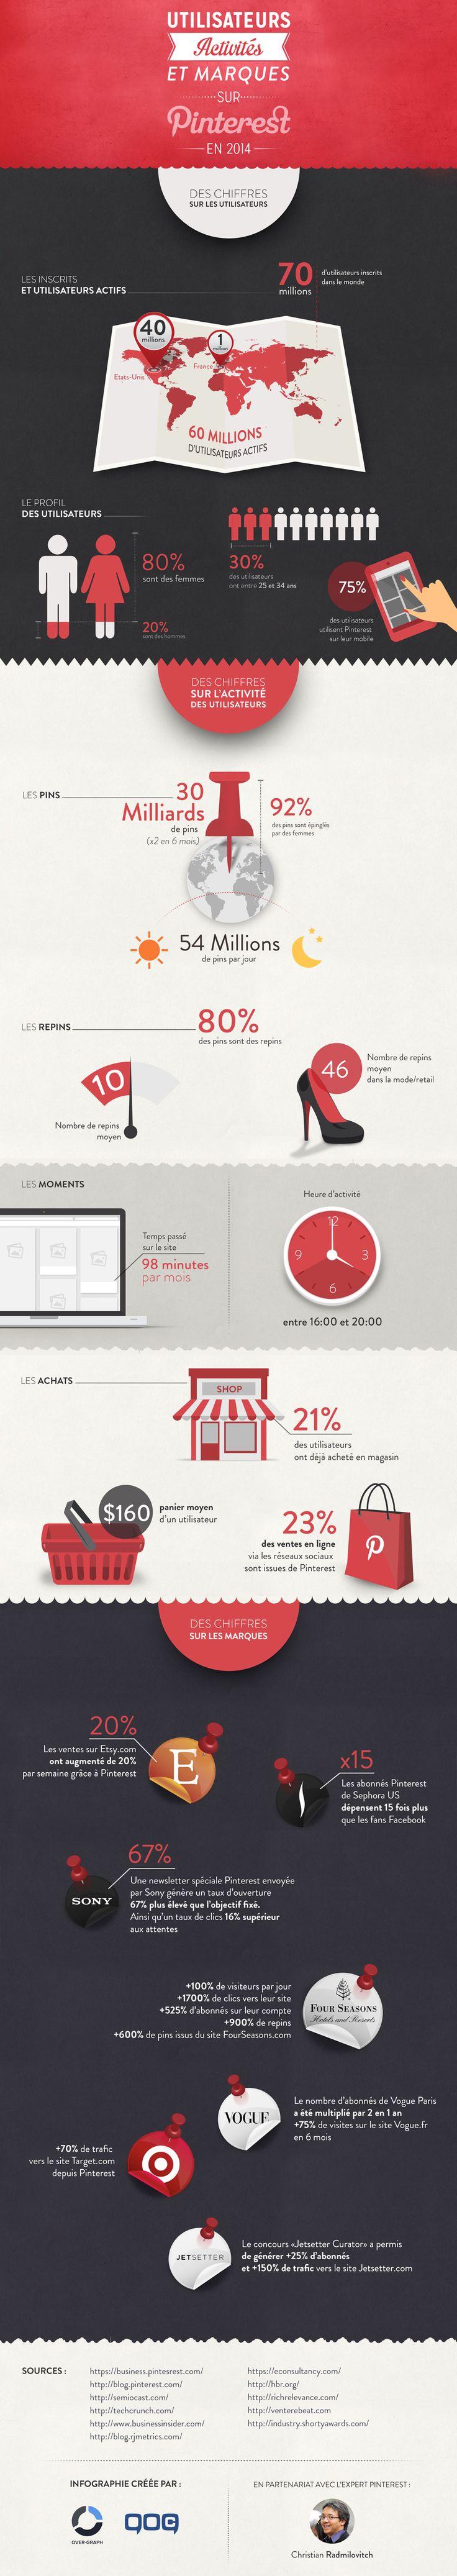 Pinterest_infographie_APACOM